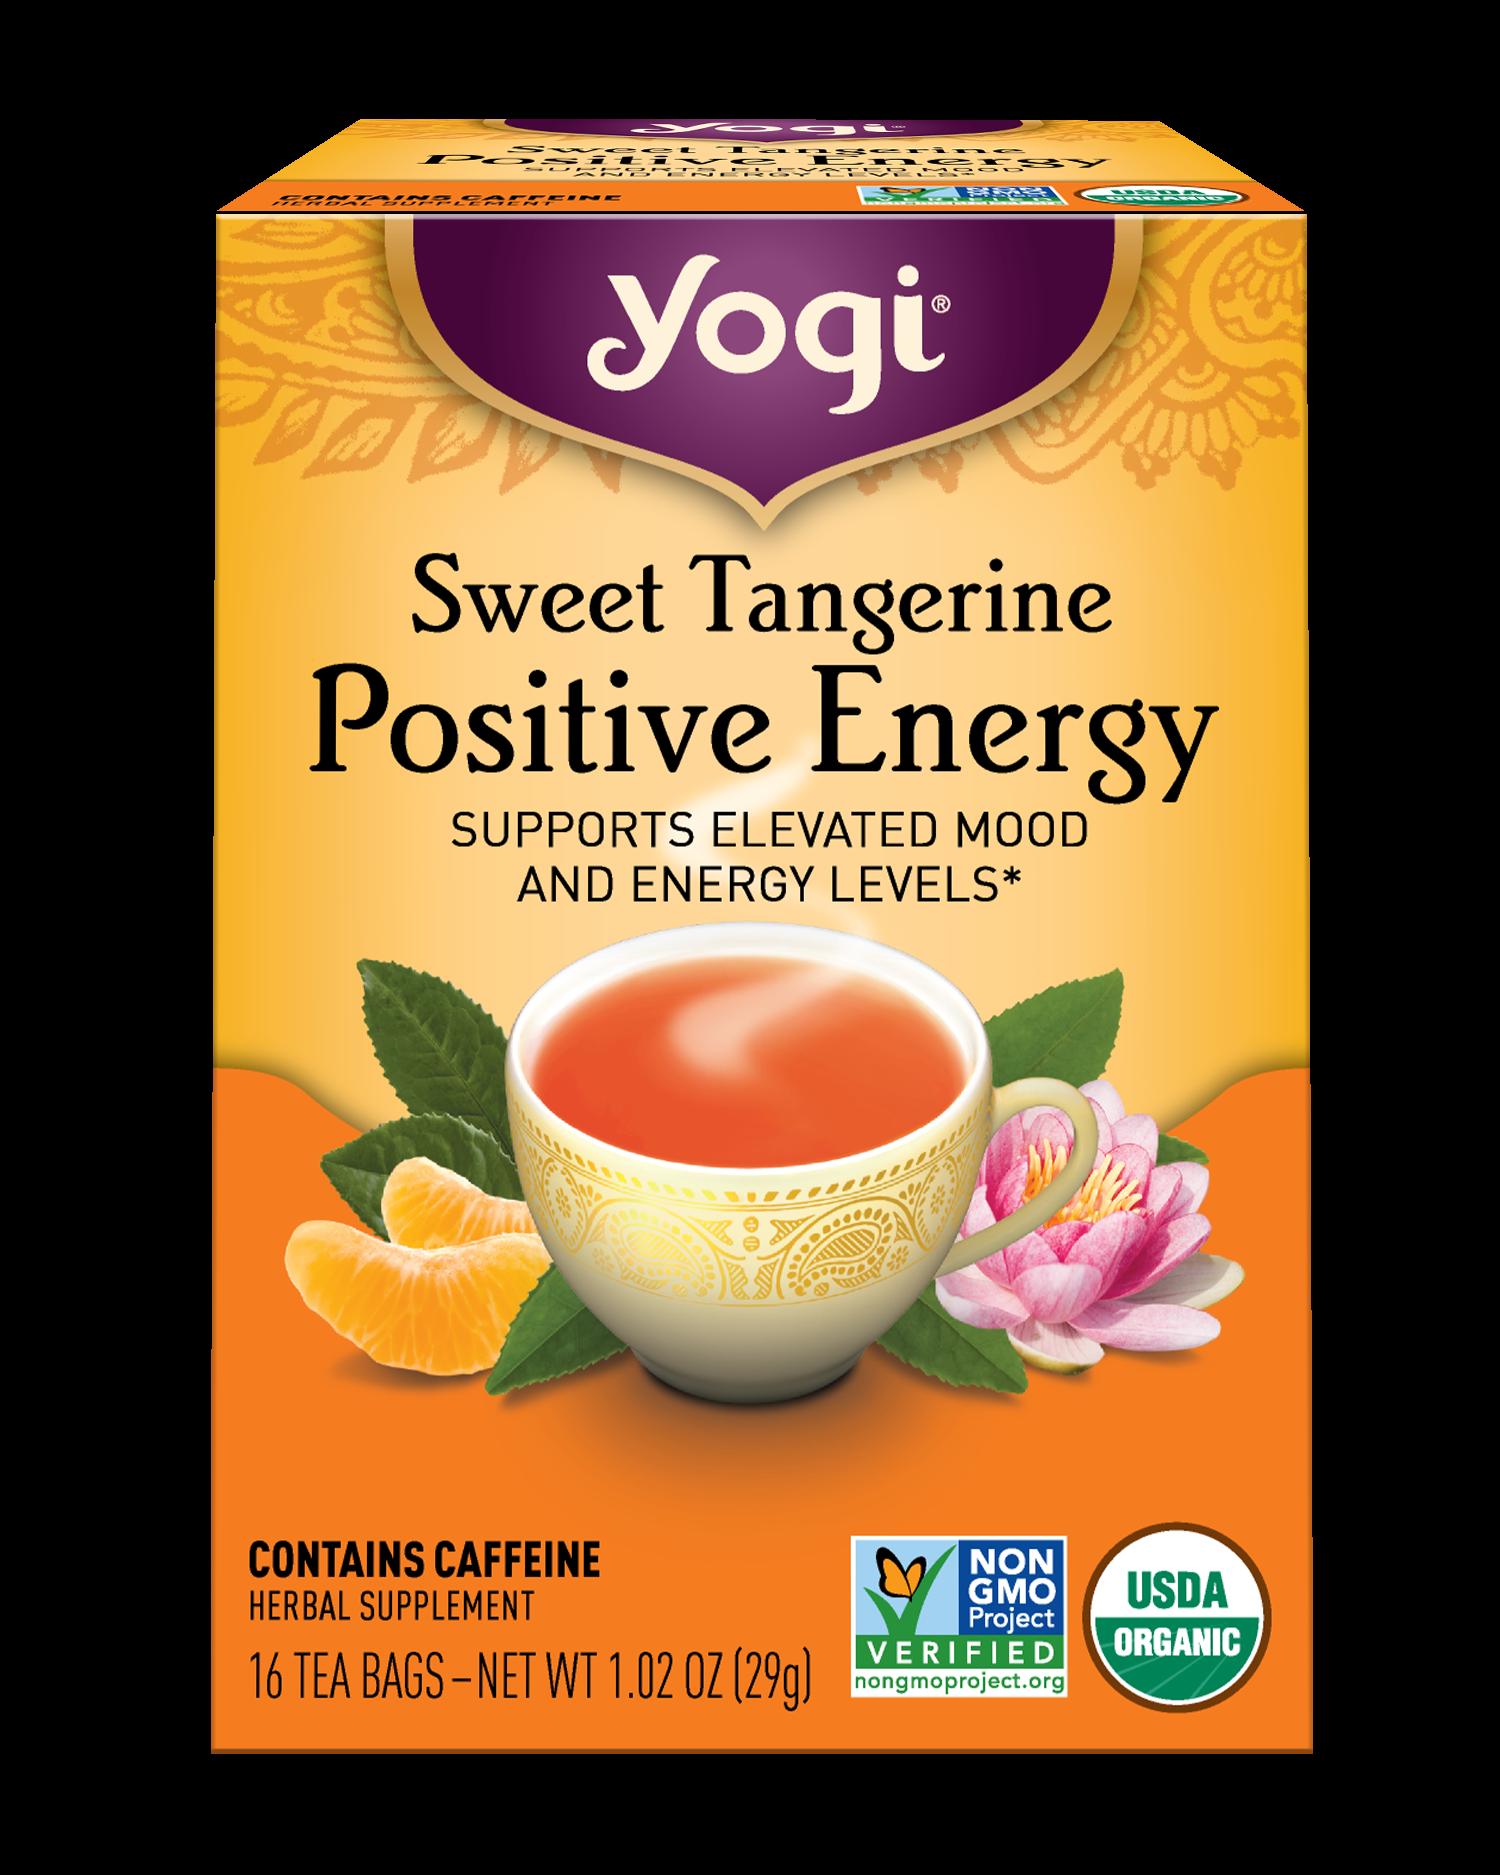 yt us sweettangerinepositiveenergy car c24 202440 3dfront 1500px 300dpi png 1 1 1